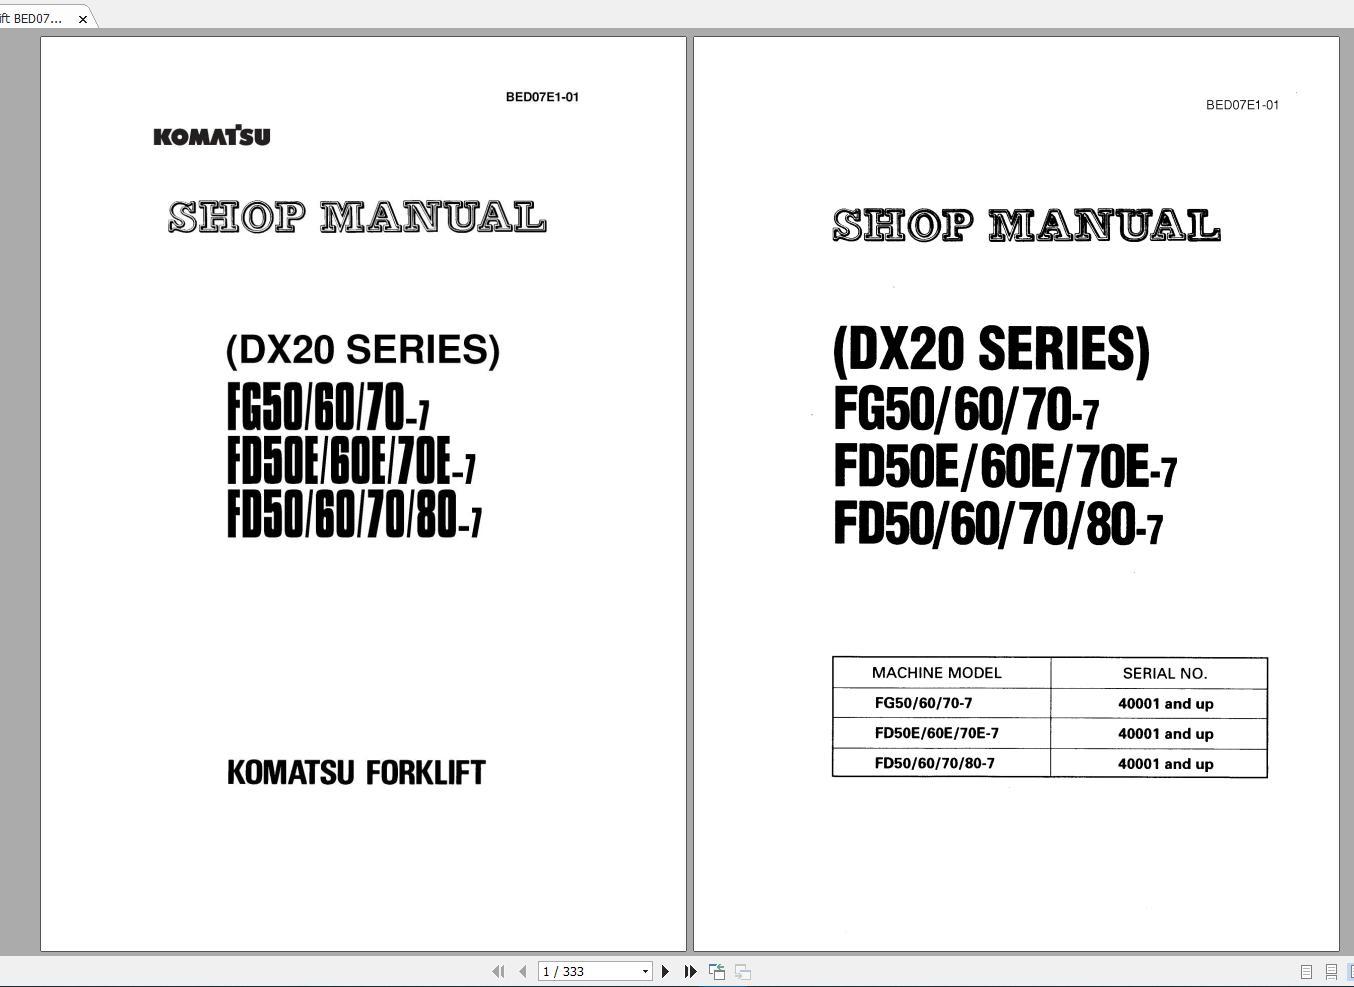 Komatsu_Forklift_Service_Manual_PDF_DVD7